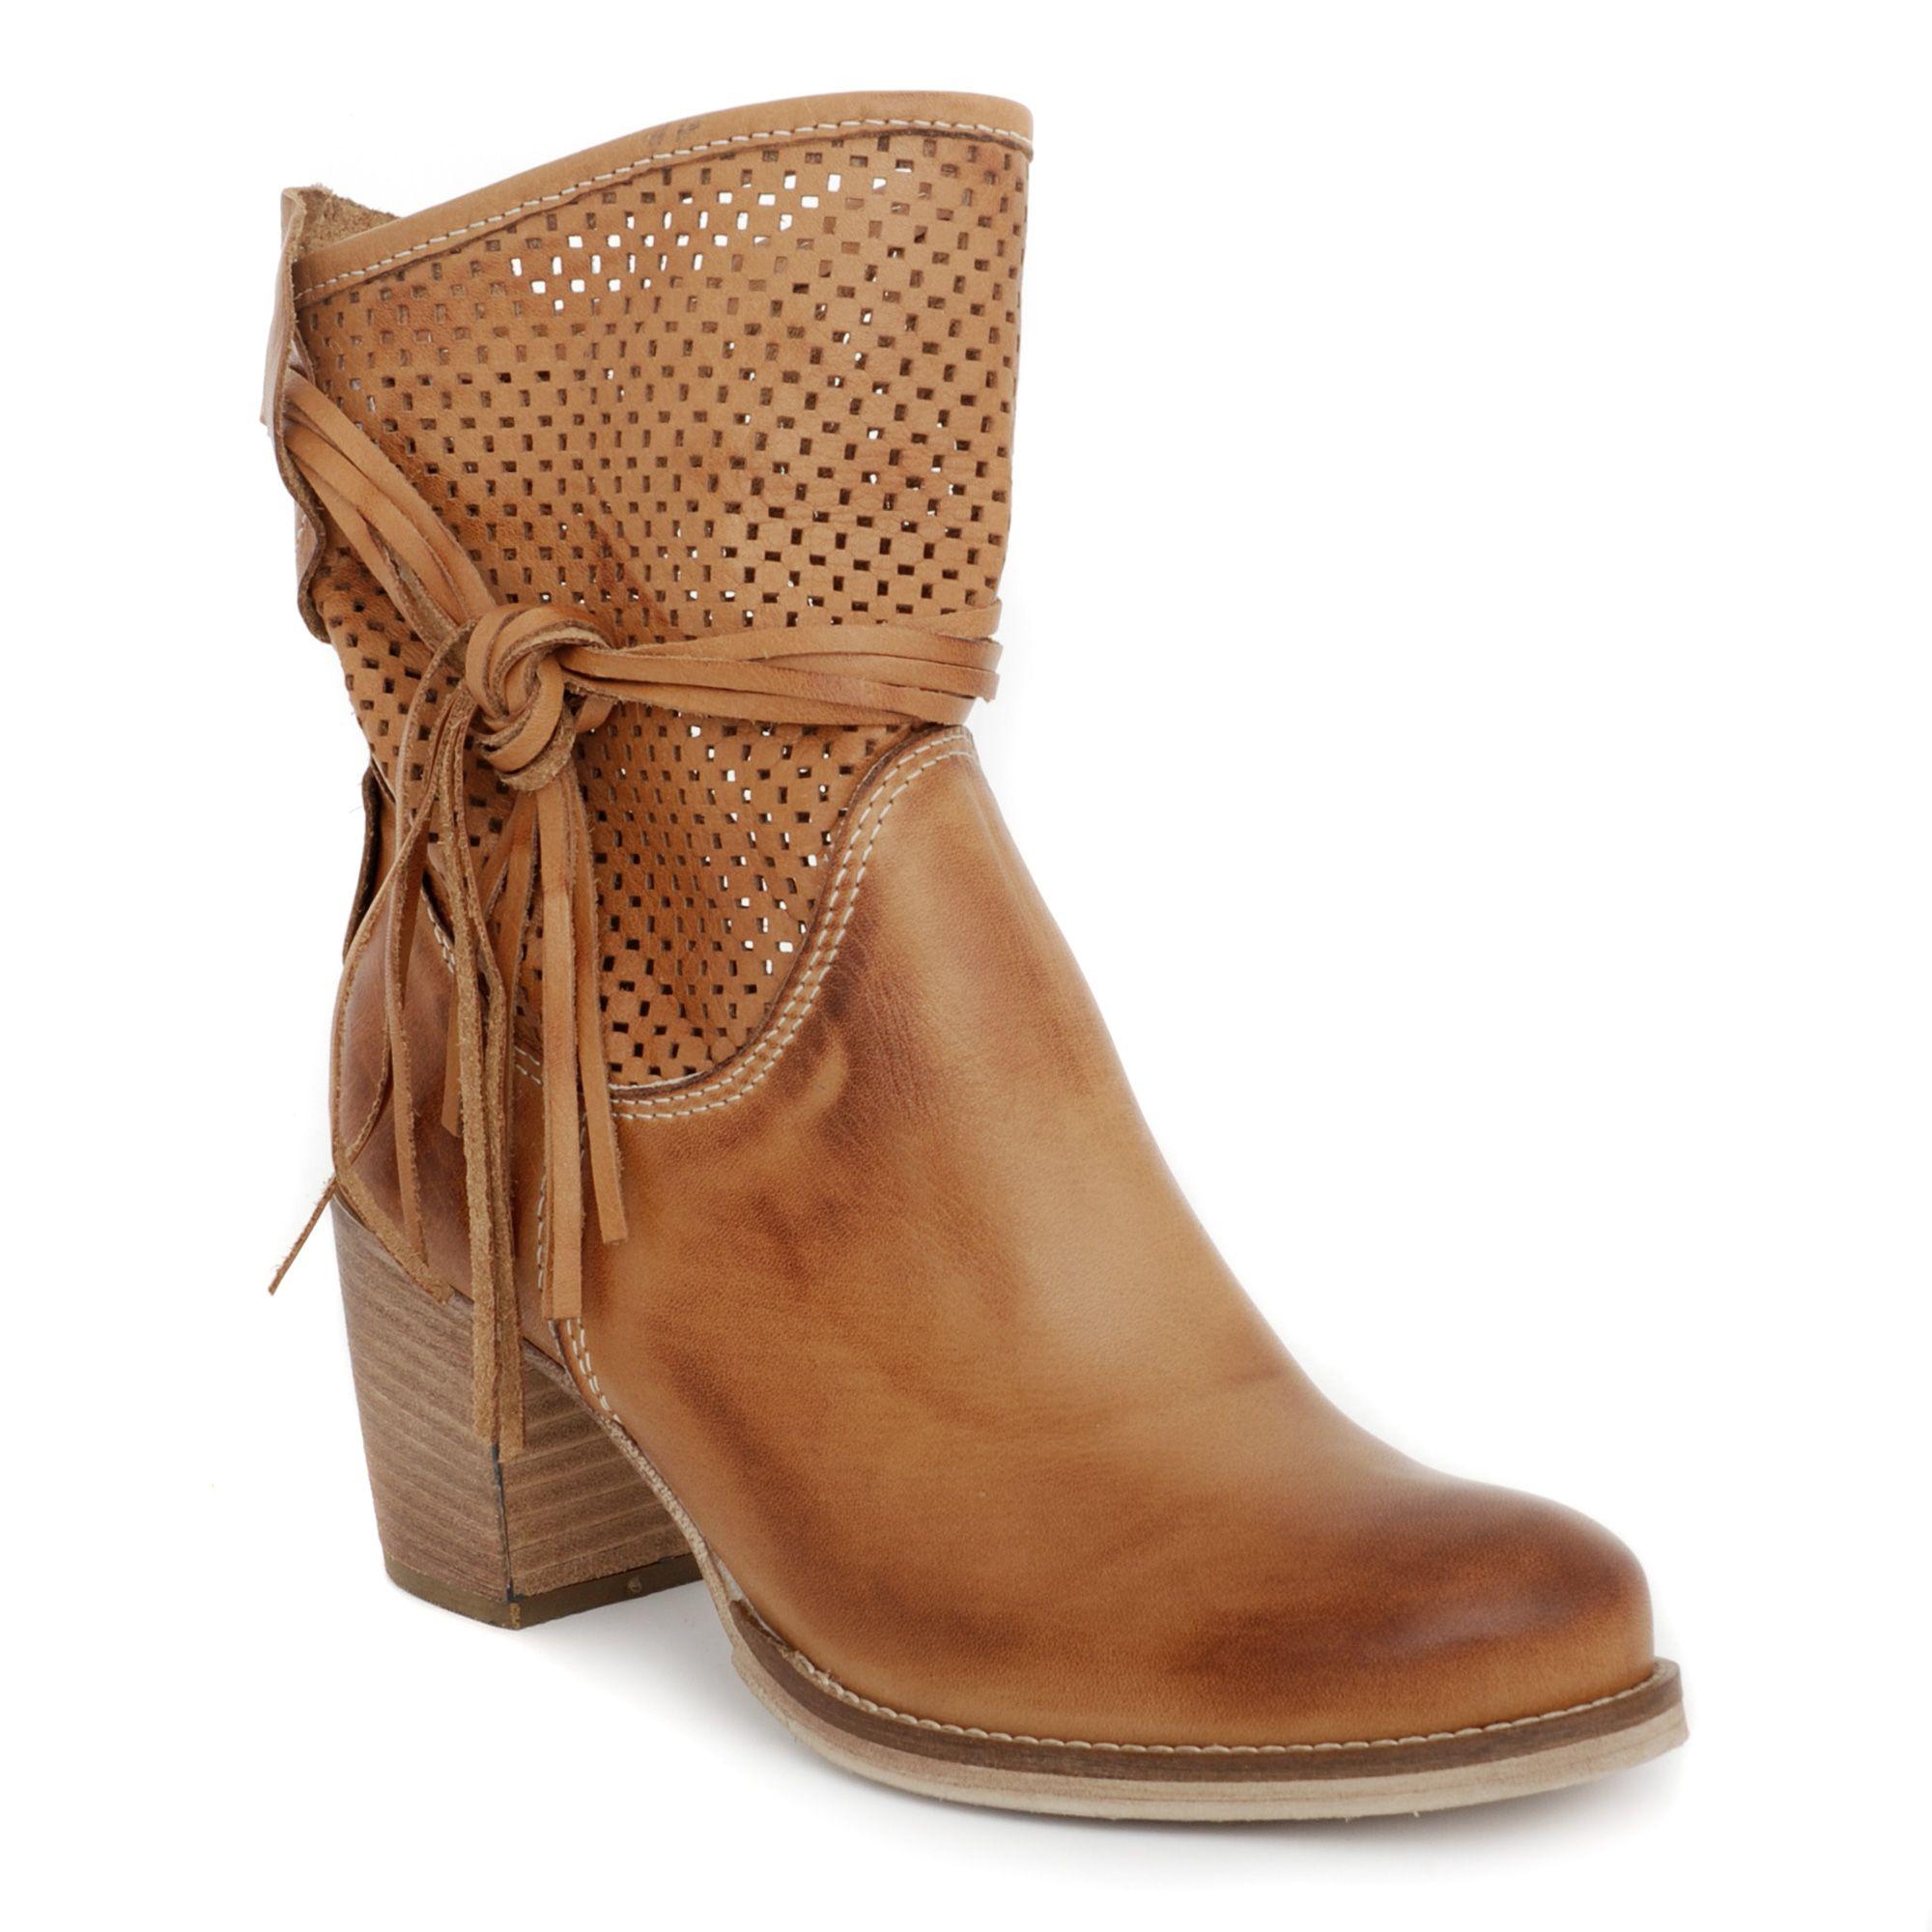 Botki Azurowe 2063 Sav Whis Shoes Boots Wedge Boot